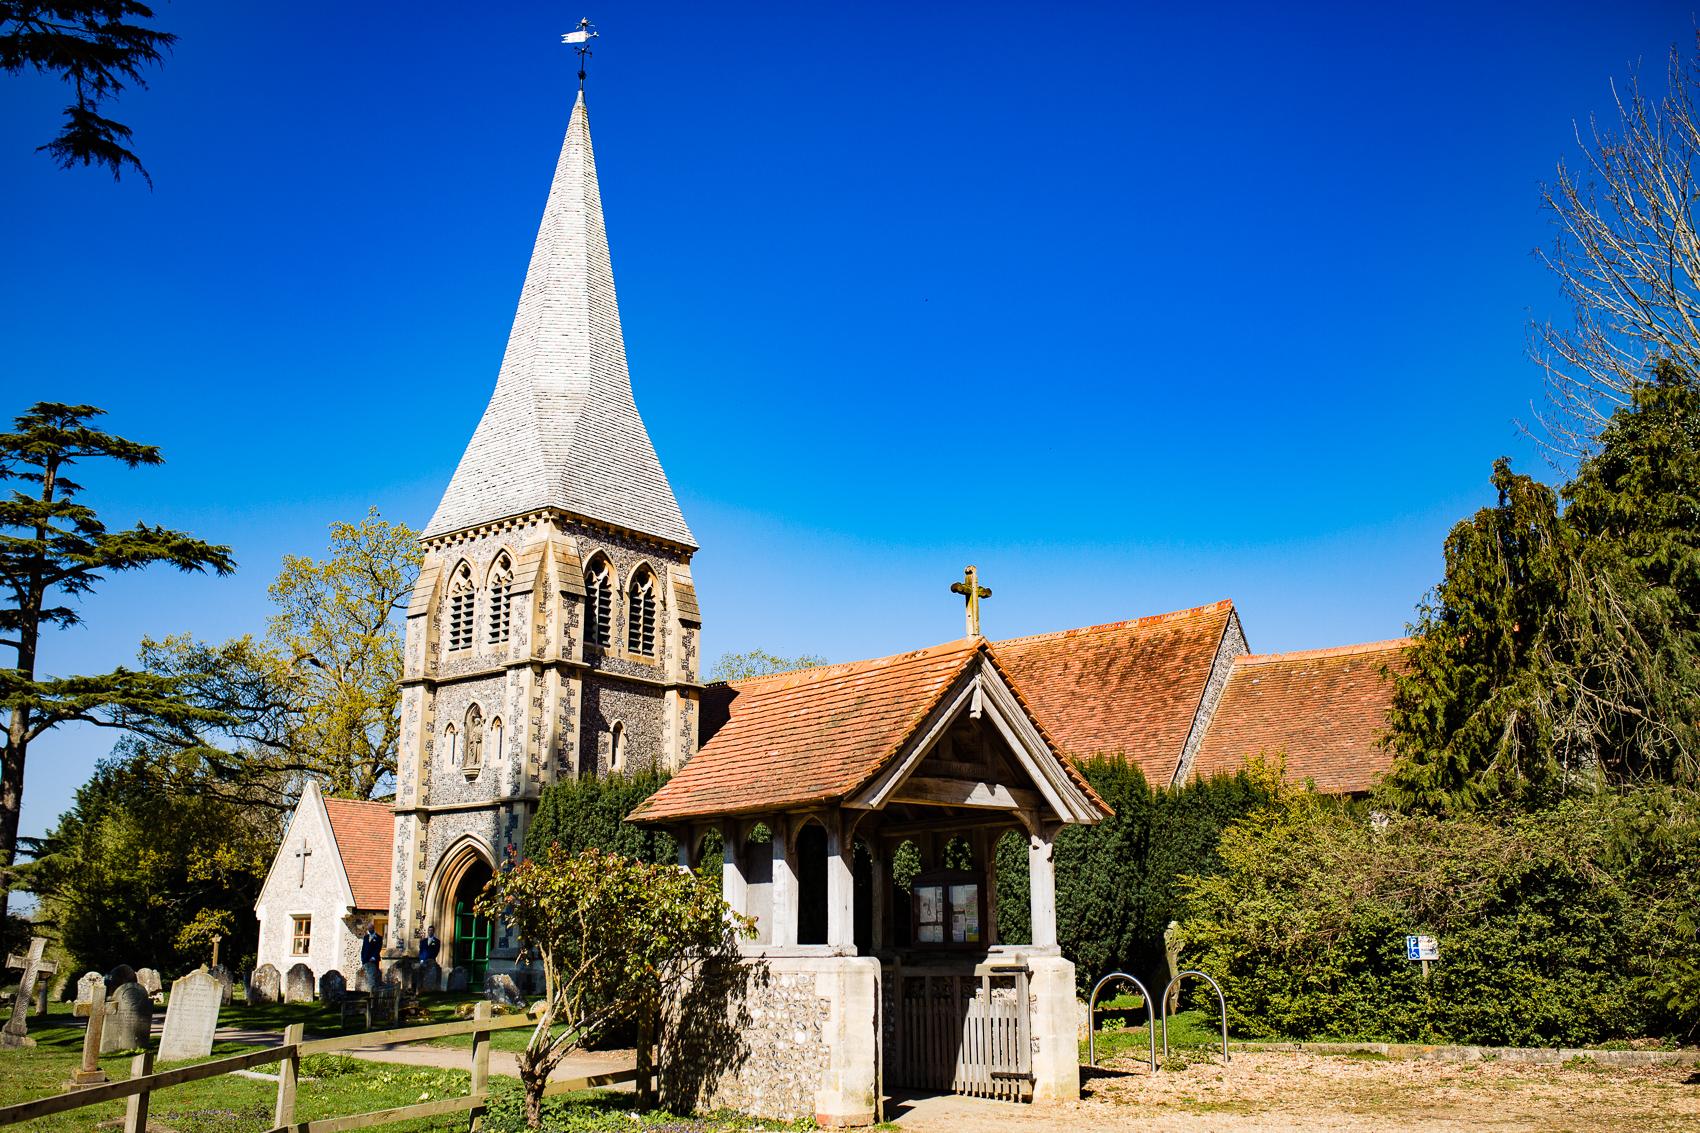 St Leonards Church Sherfield on Loddon